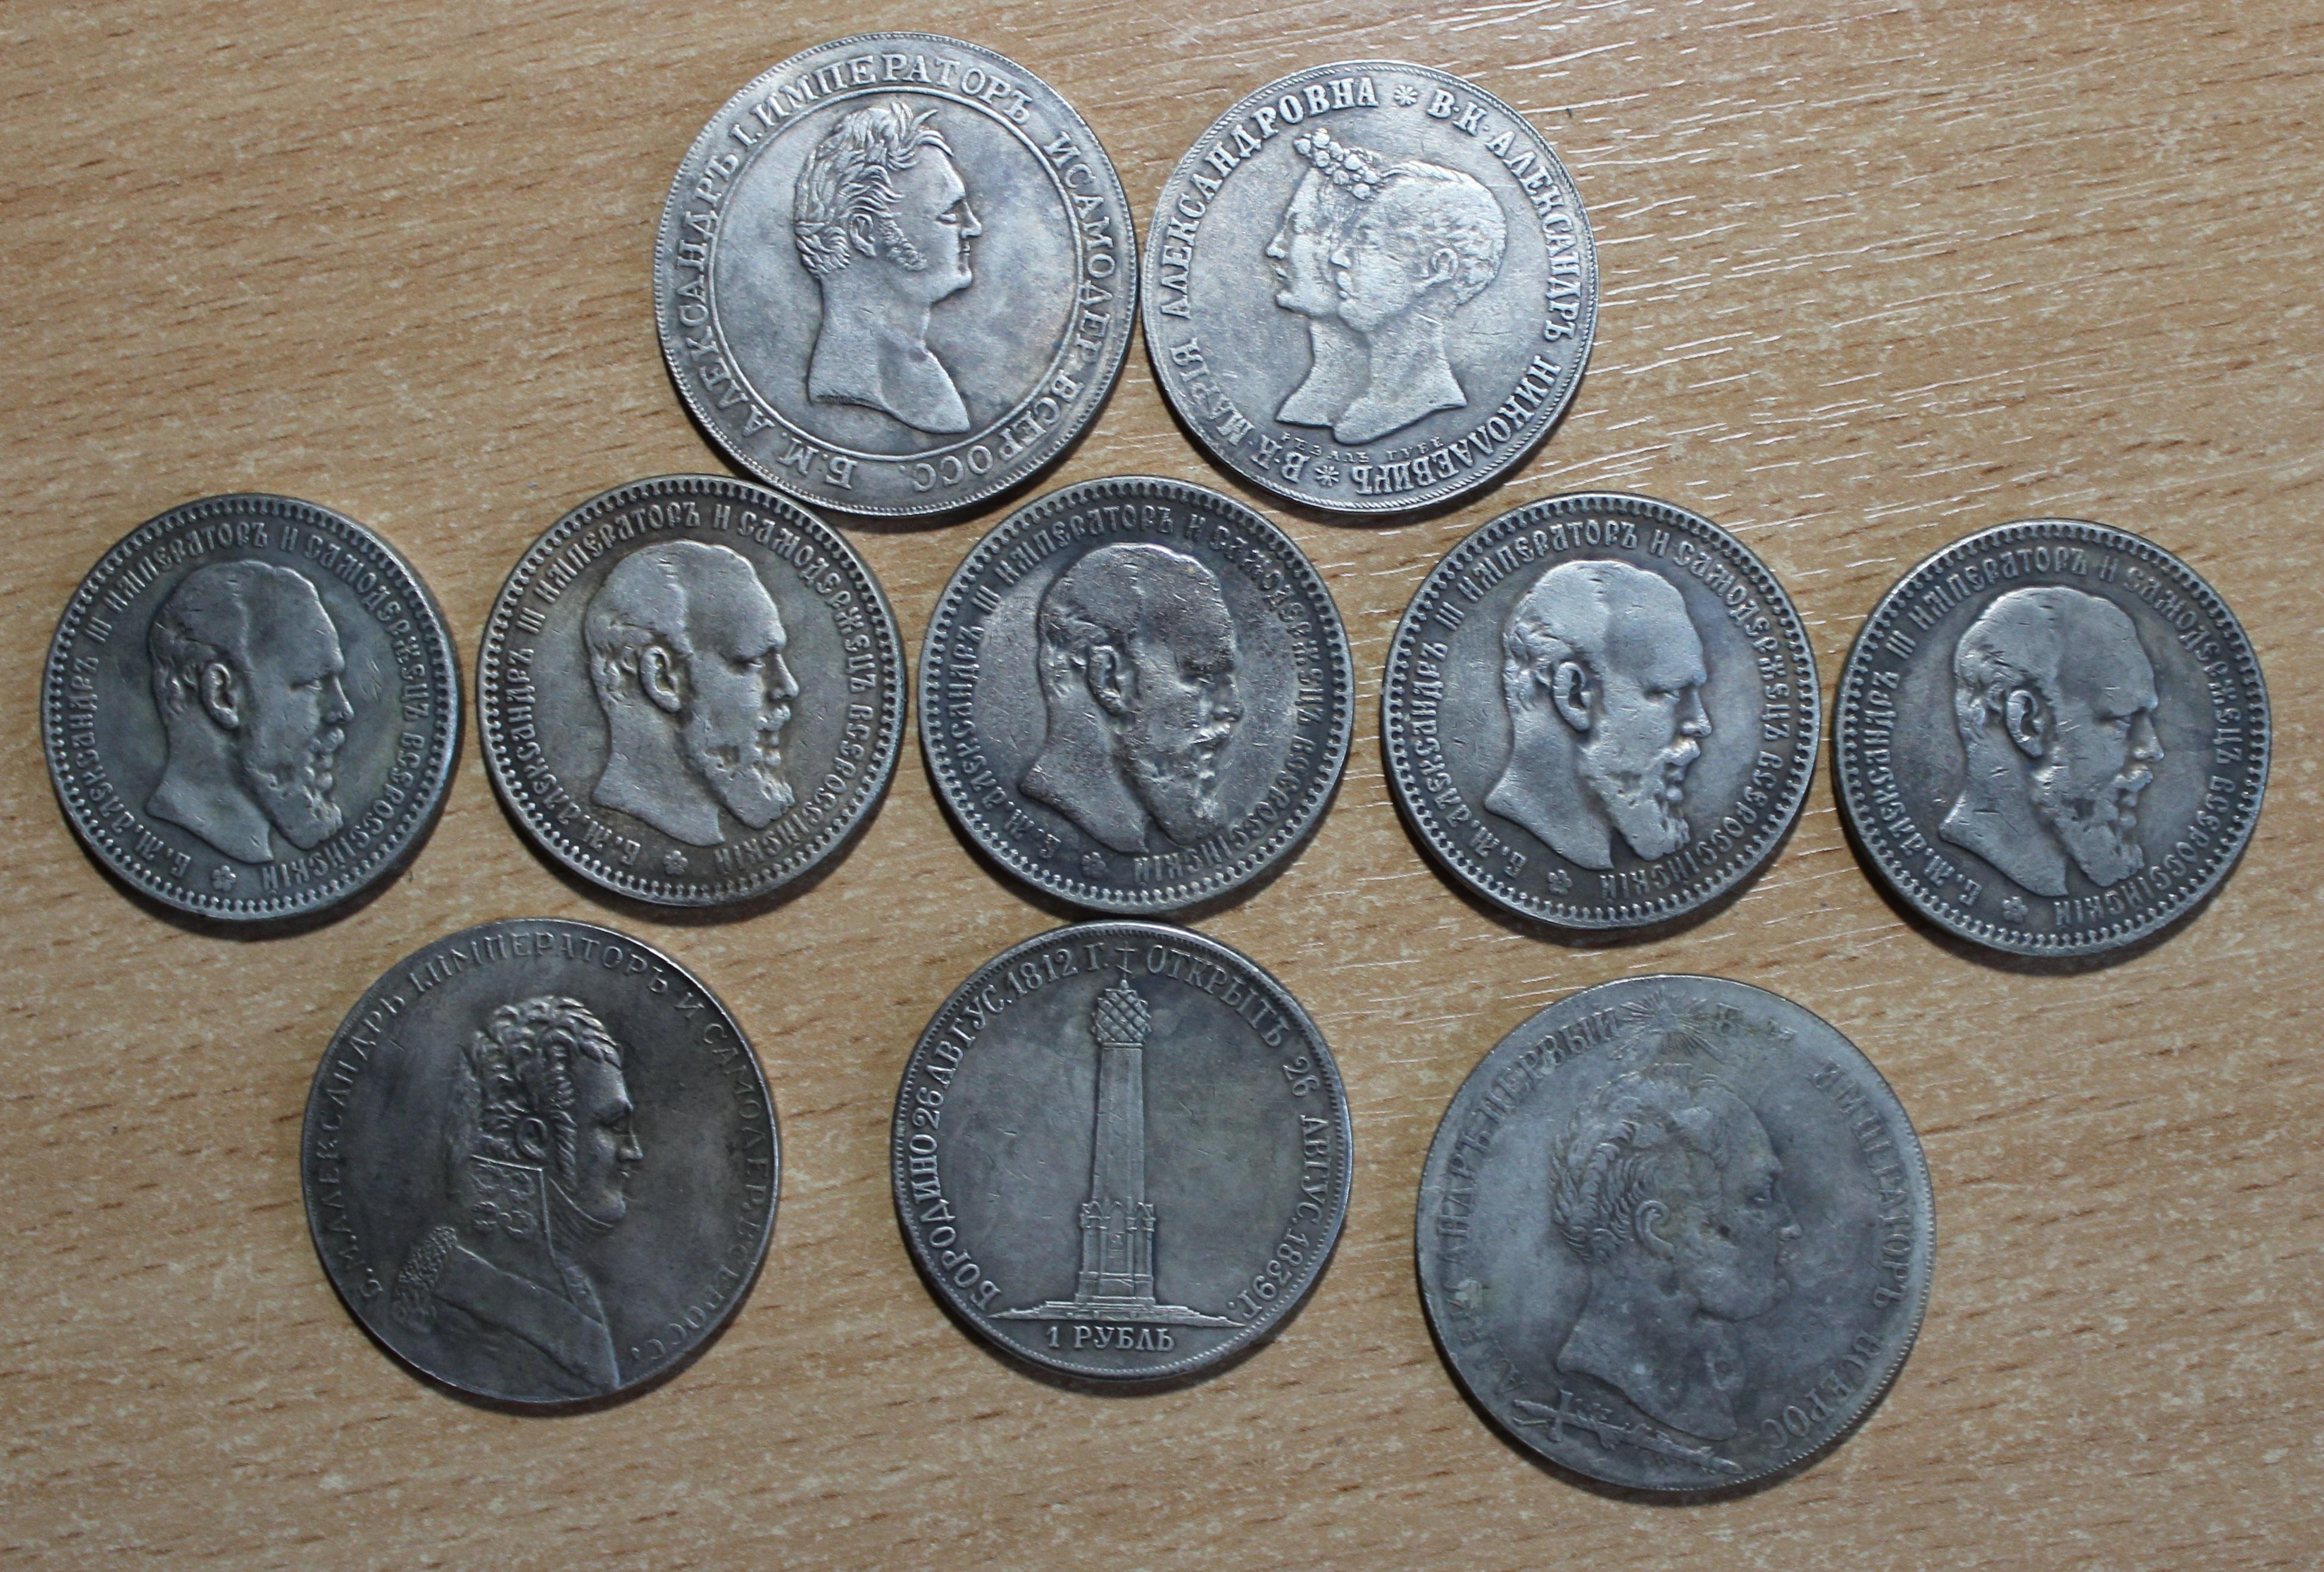 фото китайских копий царских монет рос